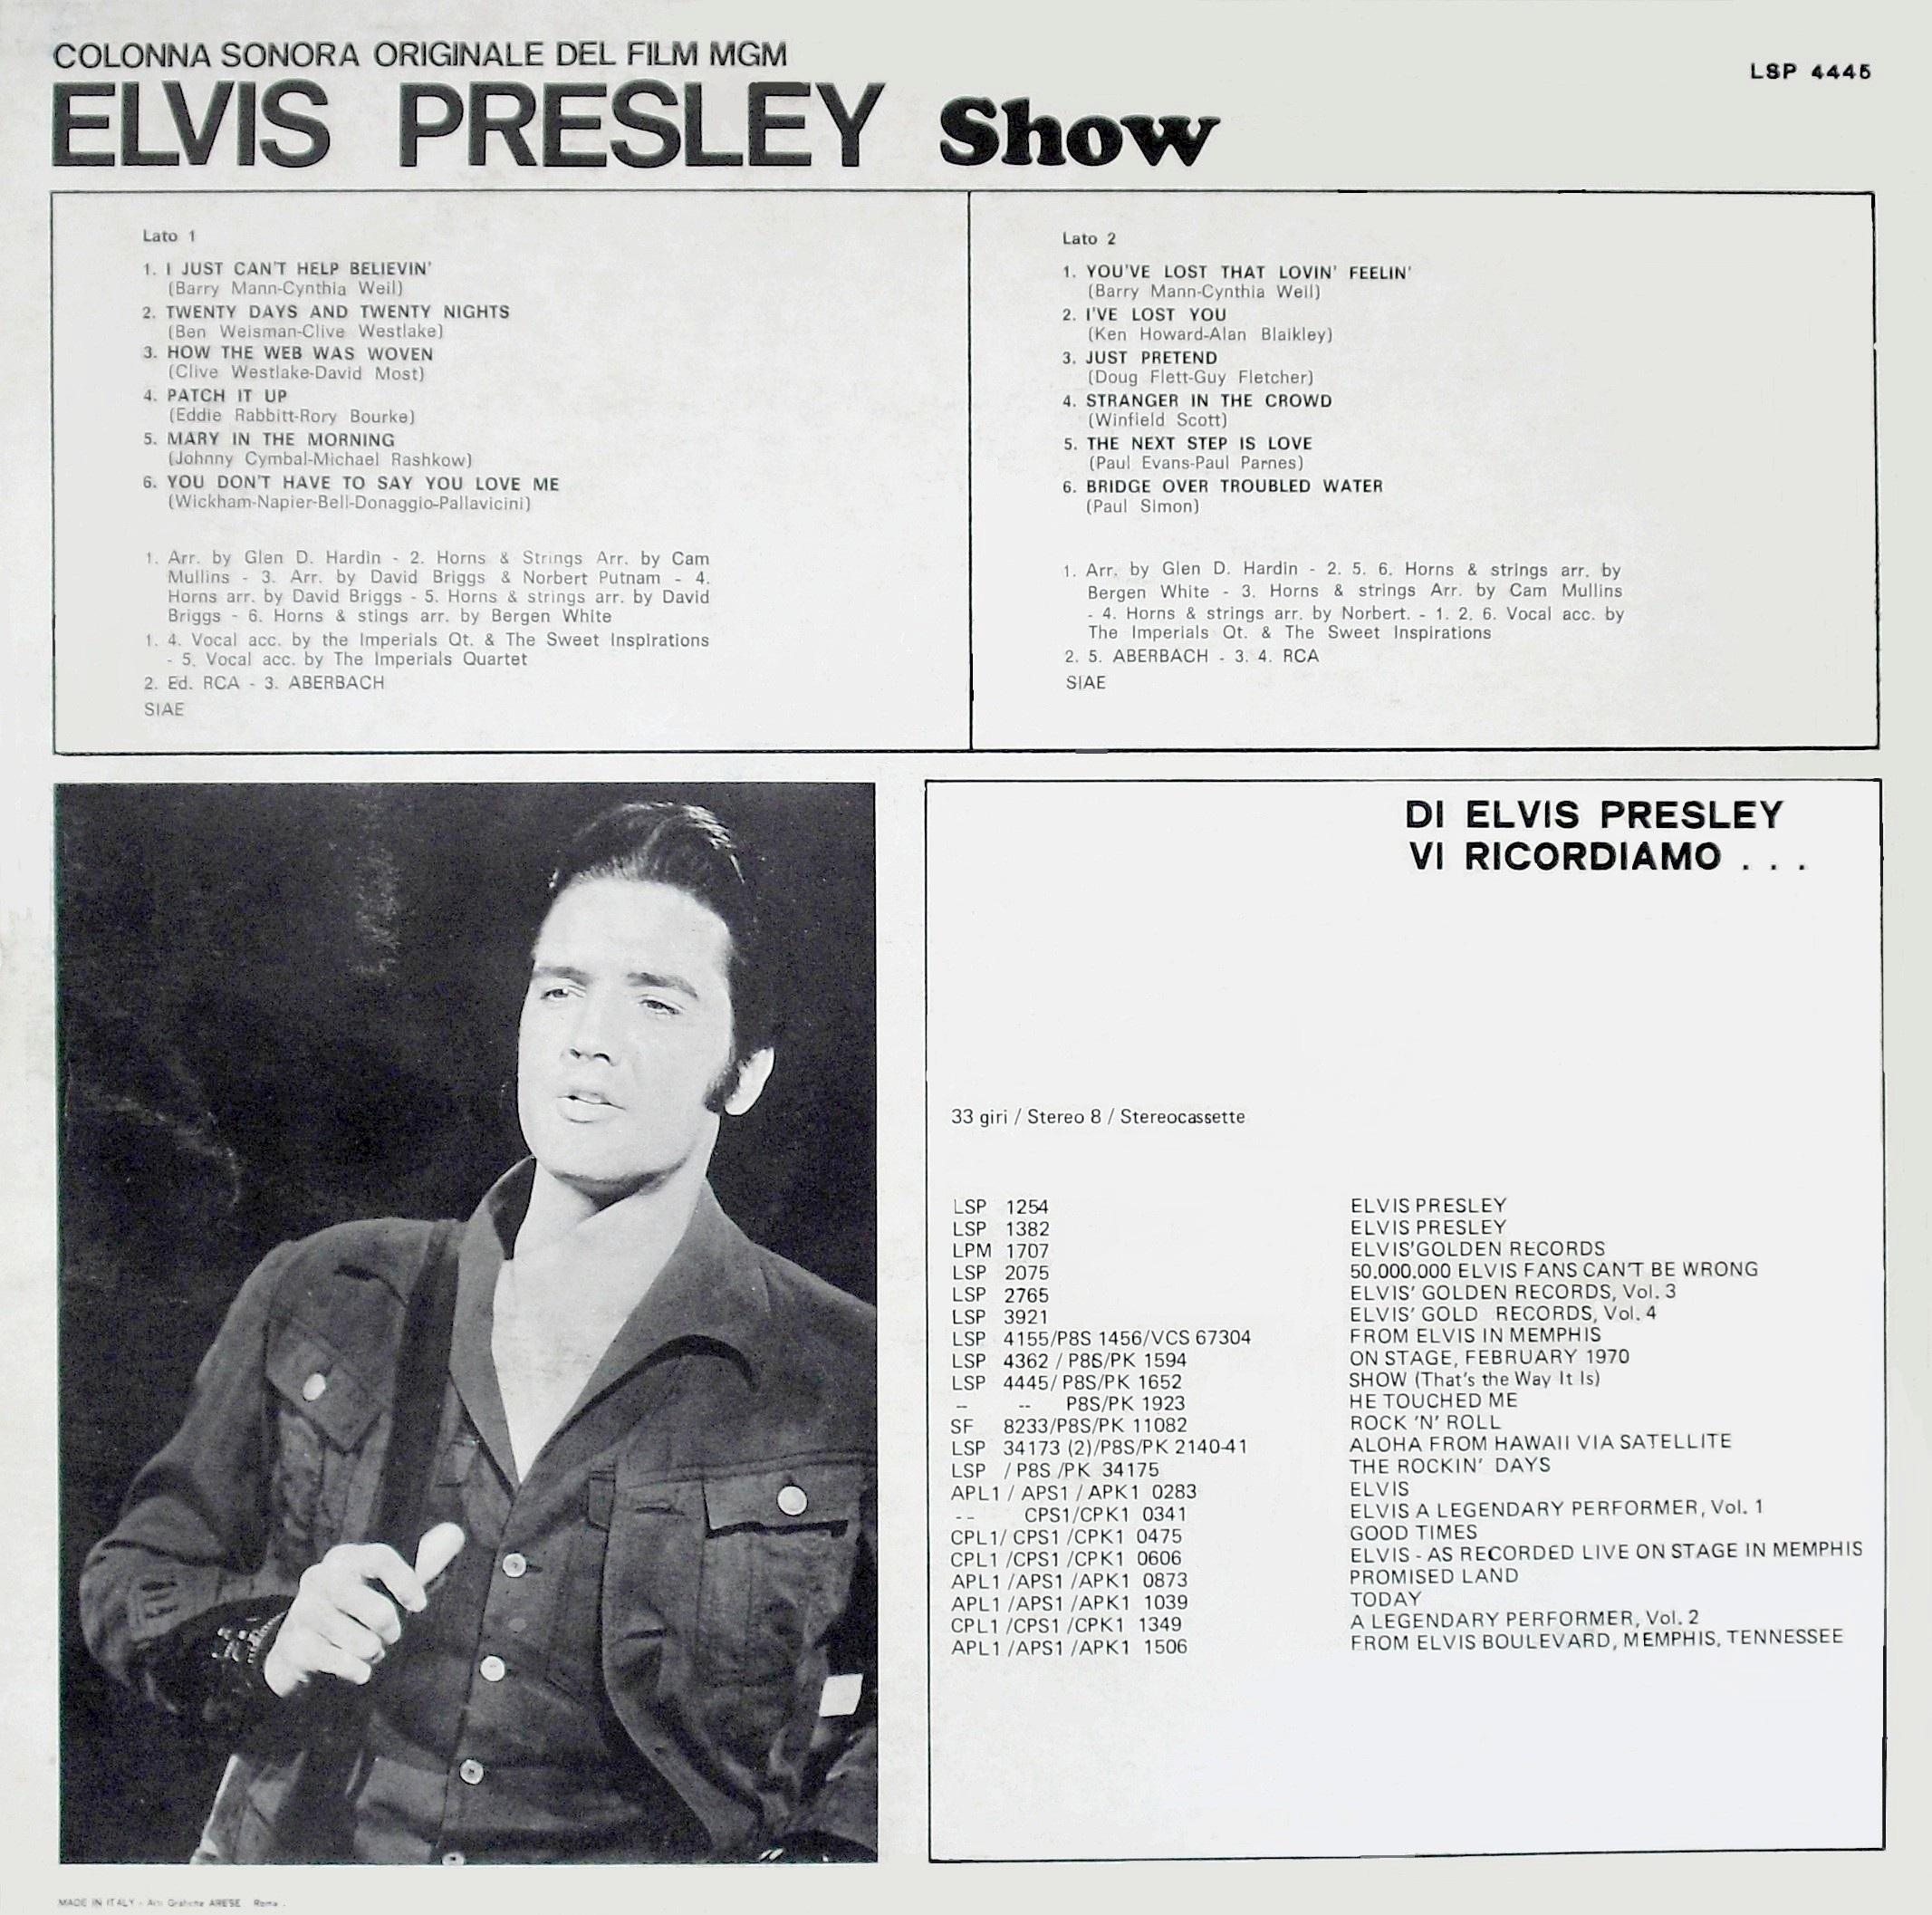 ELVIS PRESLEY SHOW (THAT`S THE WAY IT IS) 02eg7w6